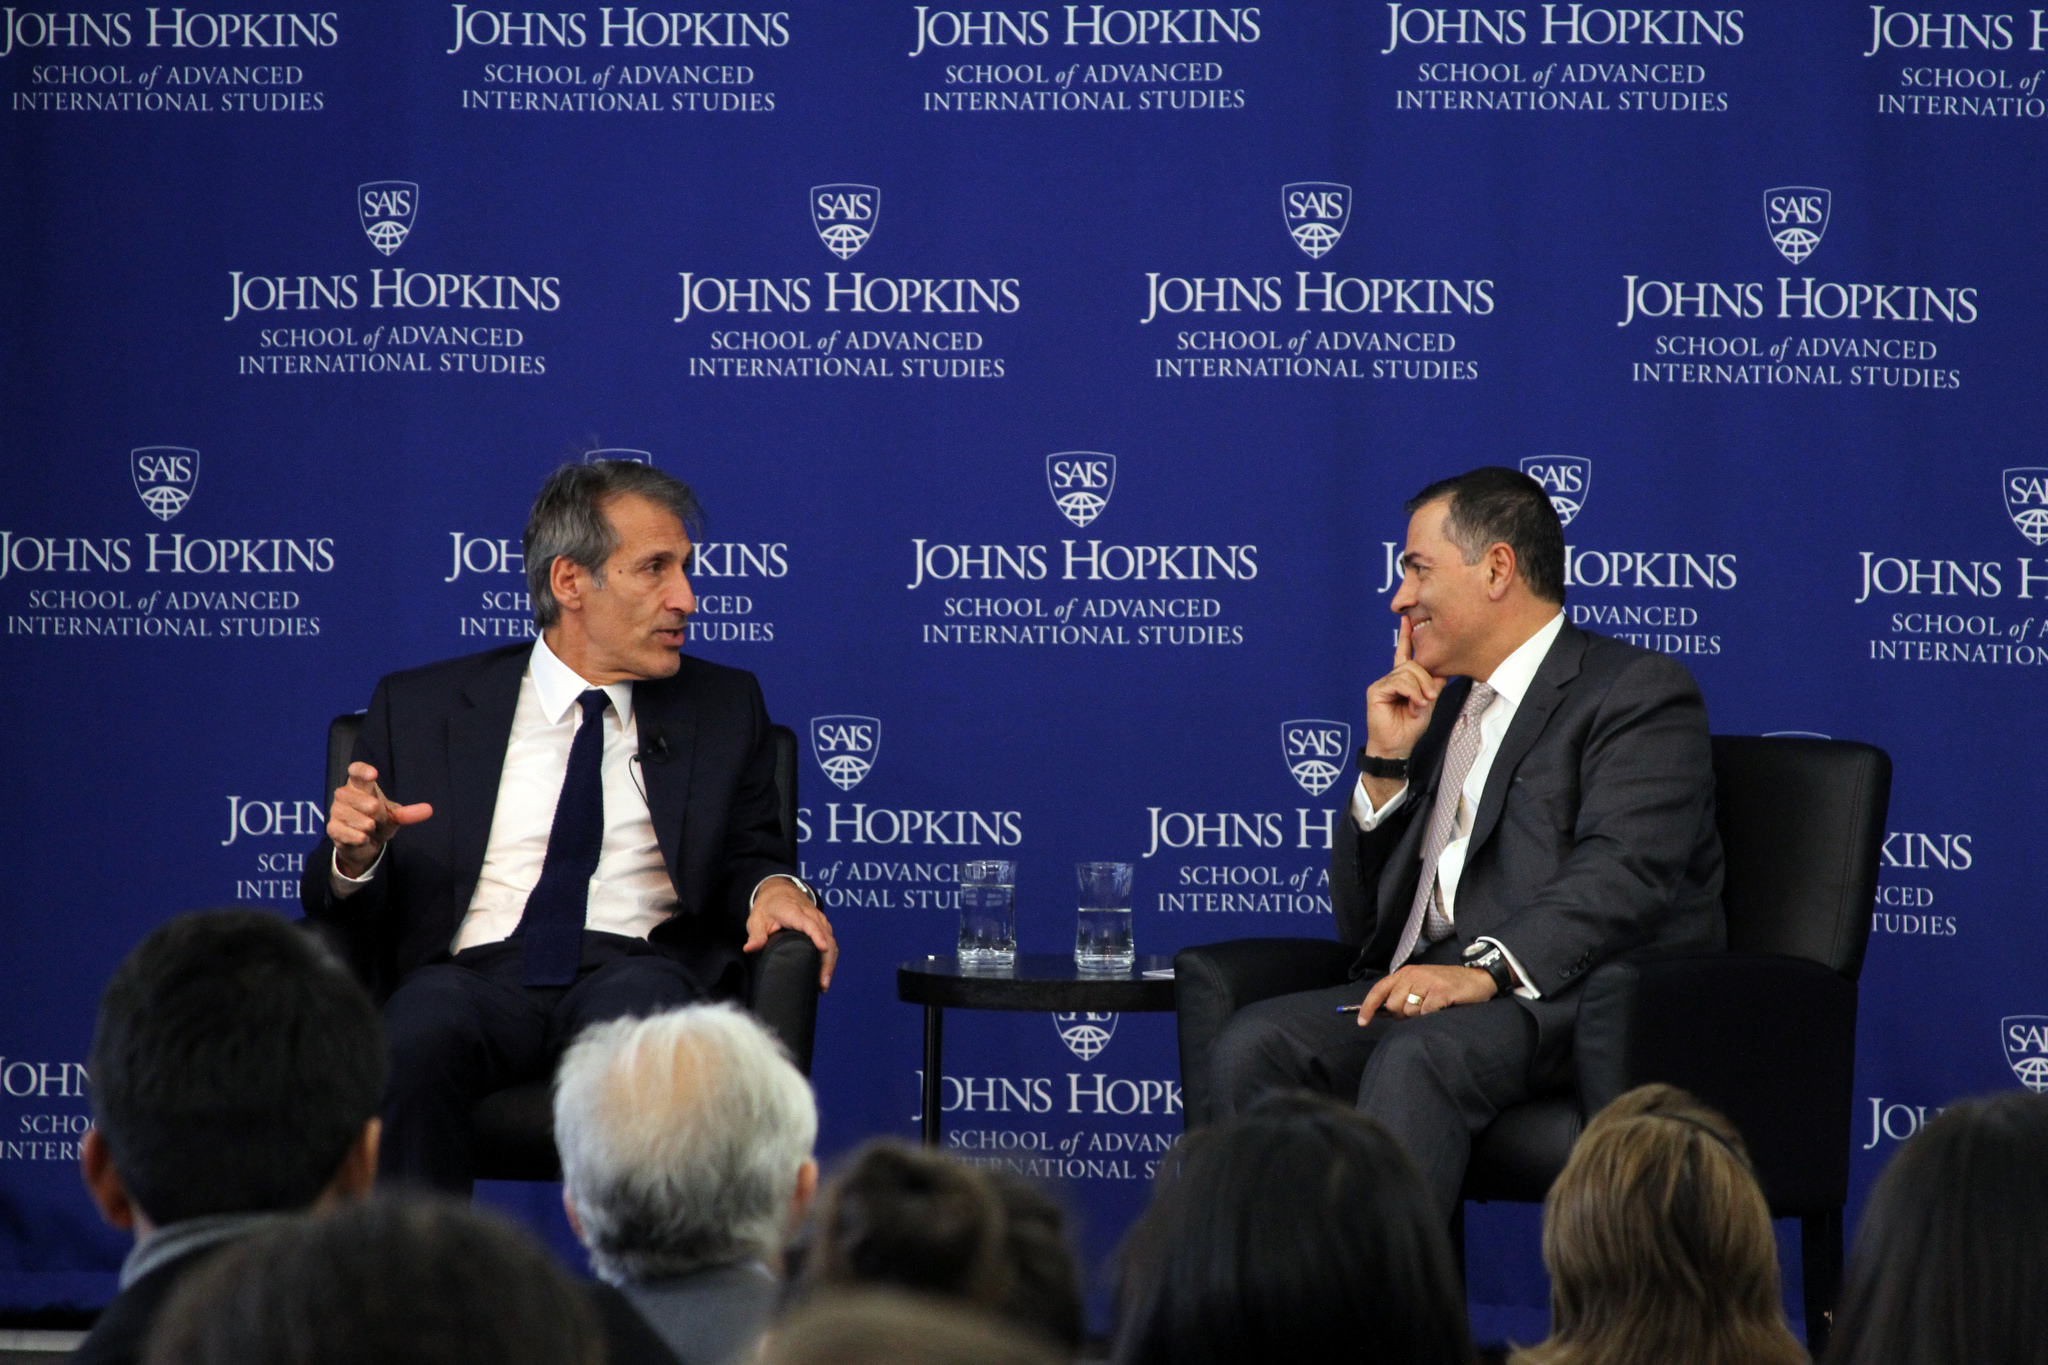 CEO of Sony Entertainment Michael Lynton and Johns Hopkins SAIS Dean Vali Nasr, October 19, 2015.